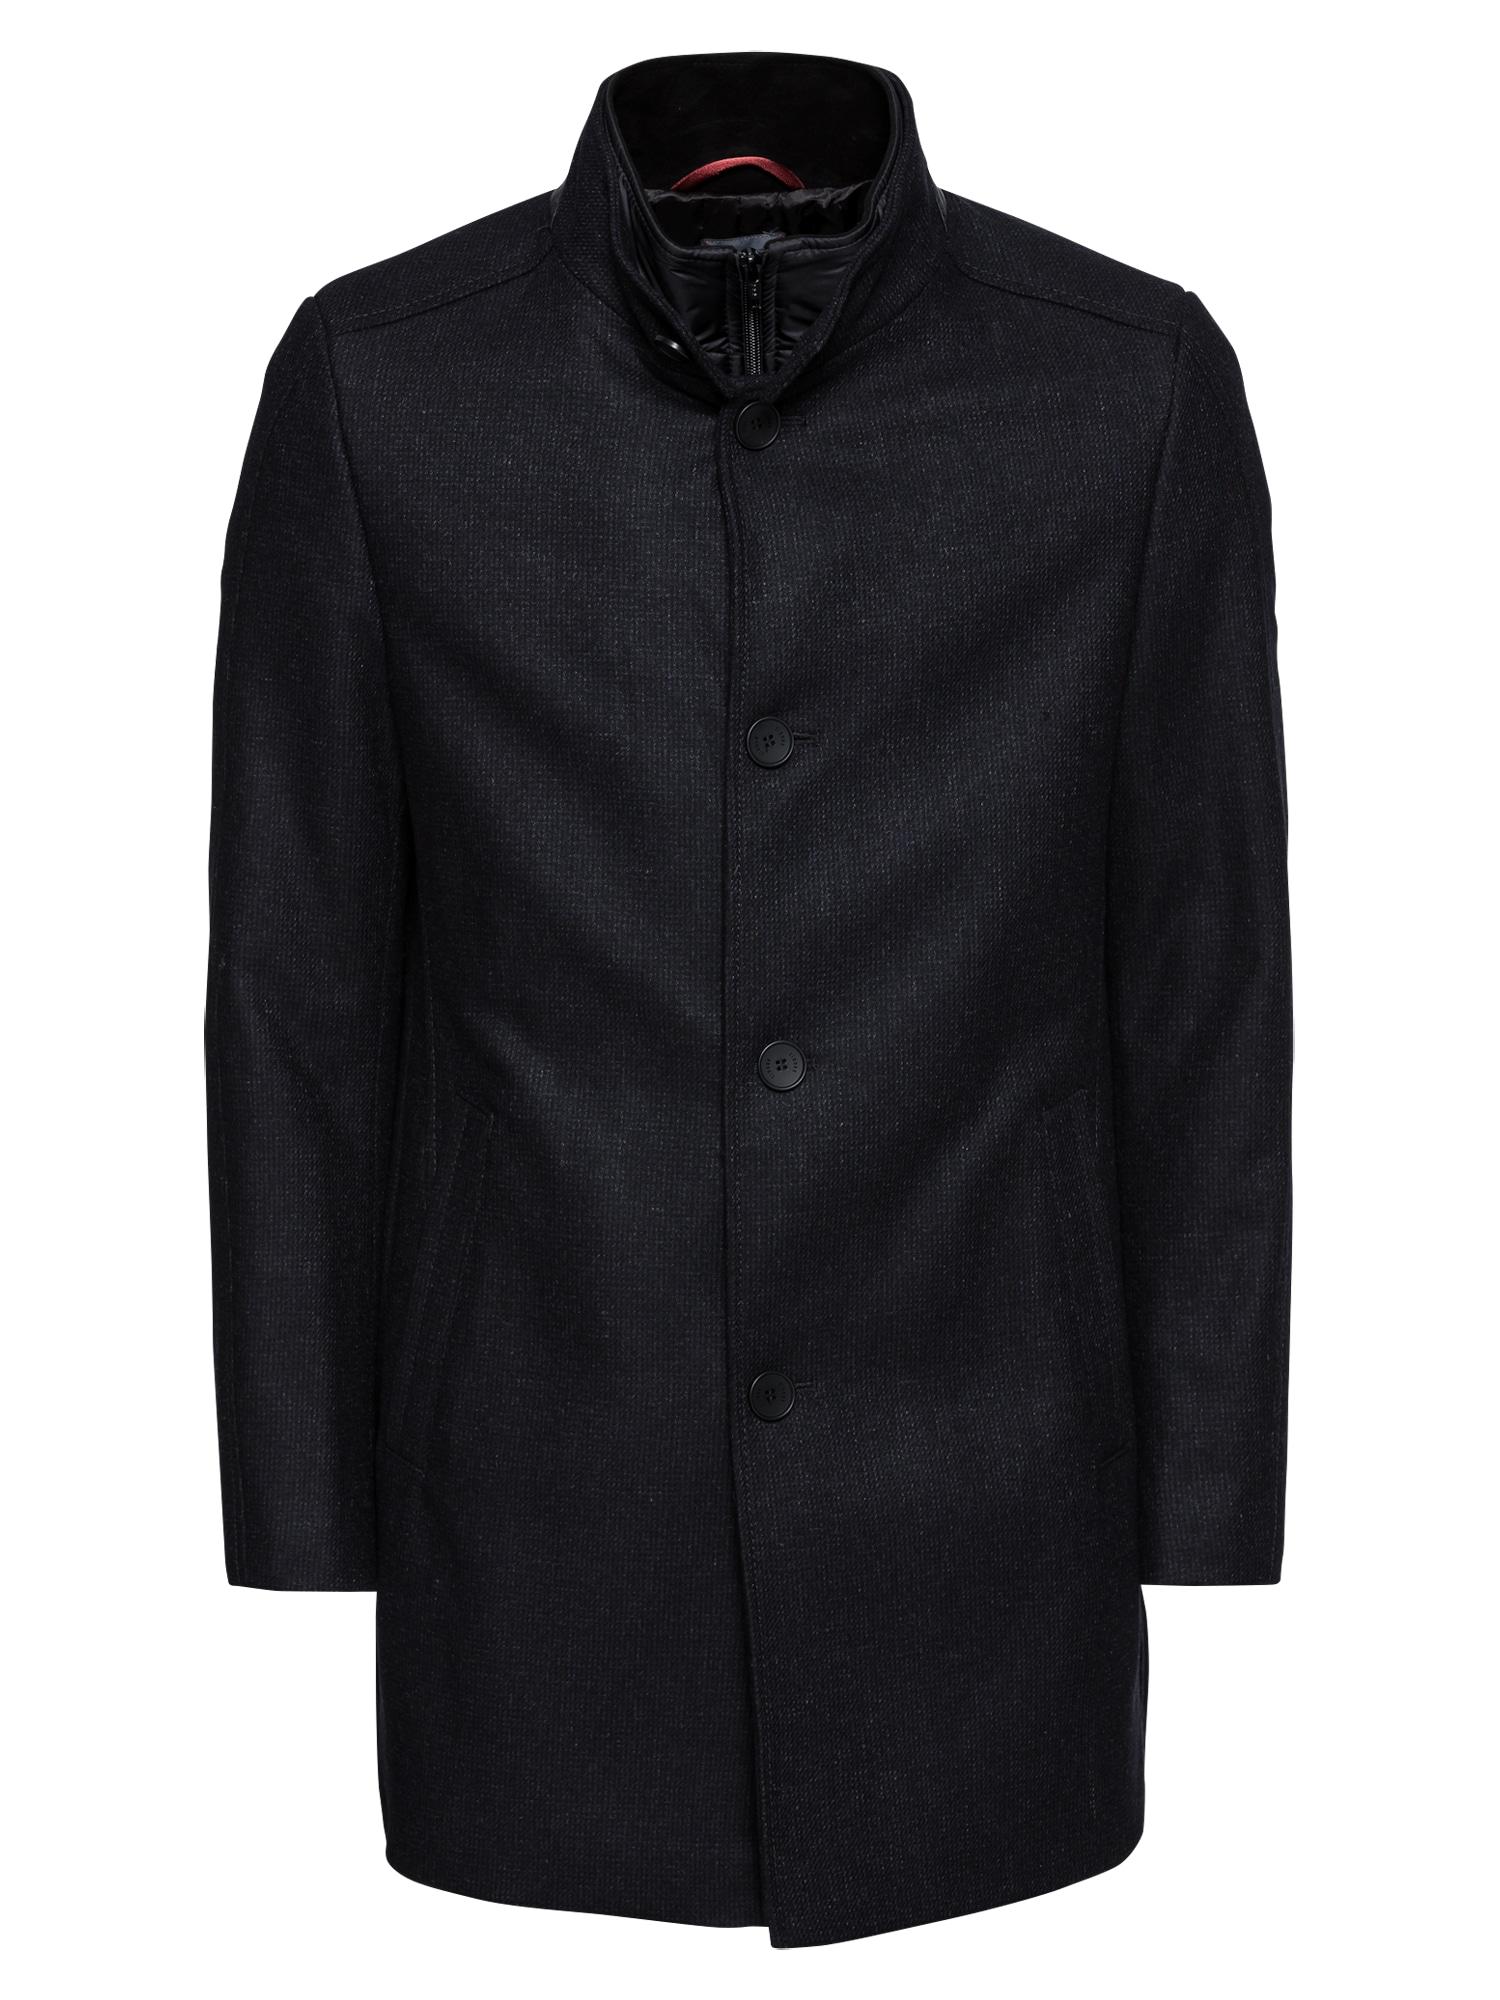 Zimní bunda CIOXFORD_BP černá CINQUE